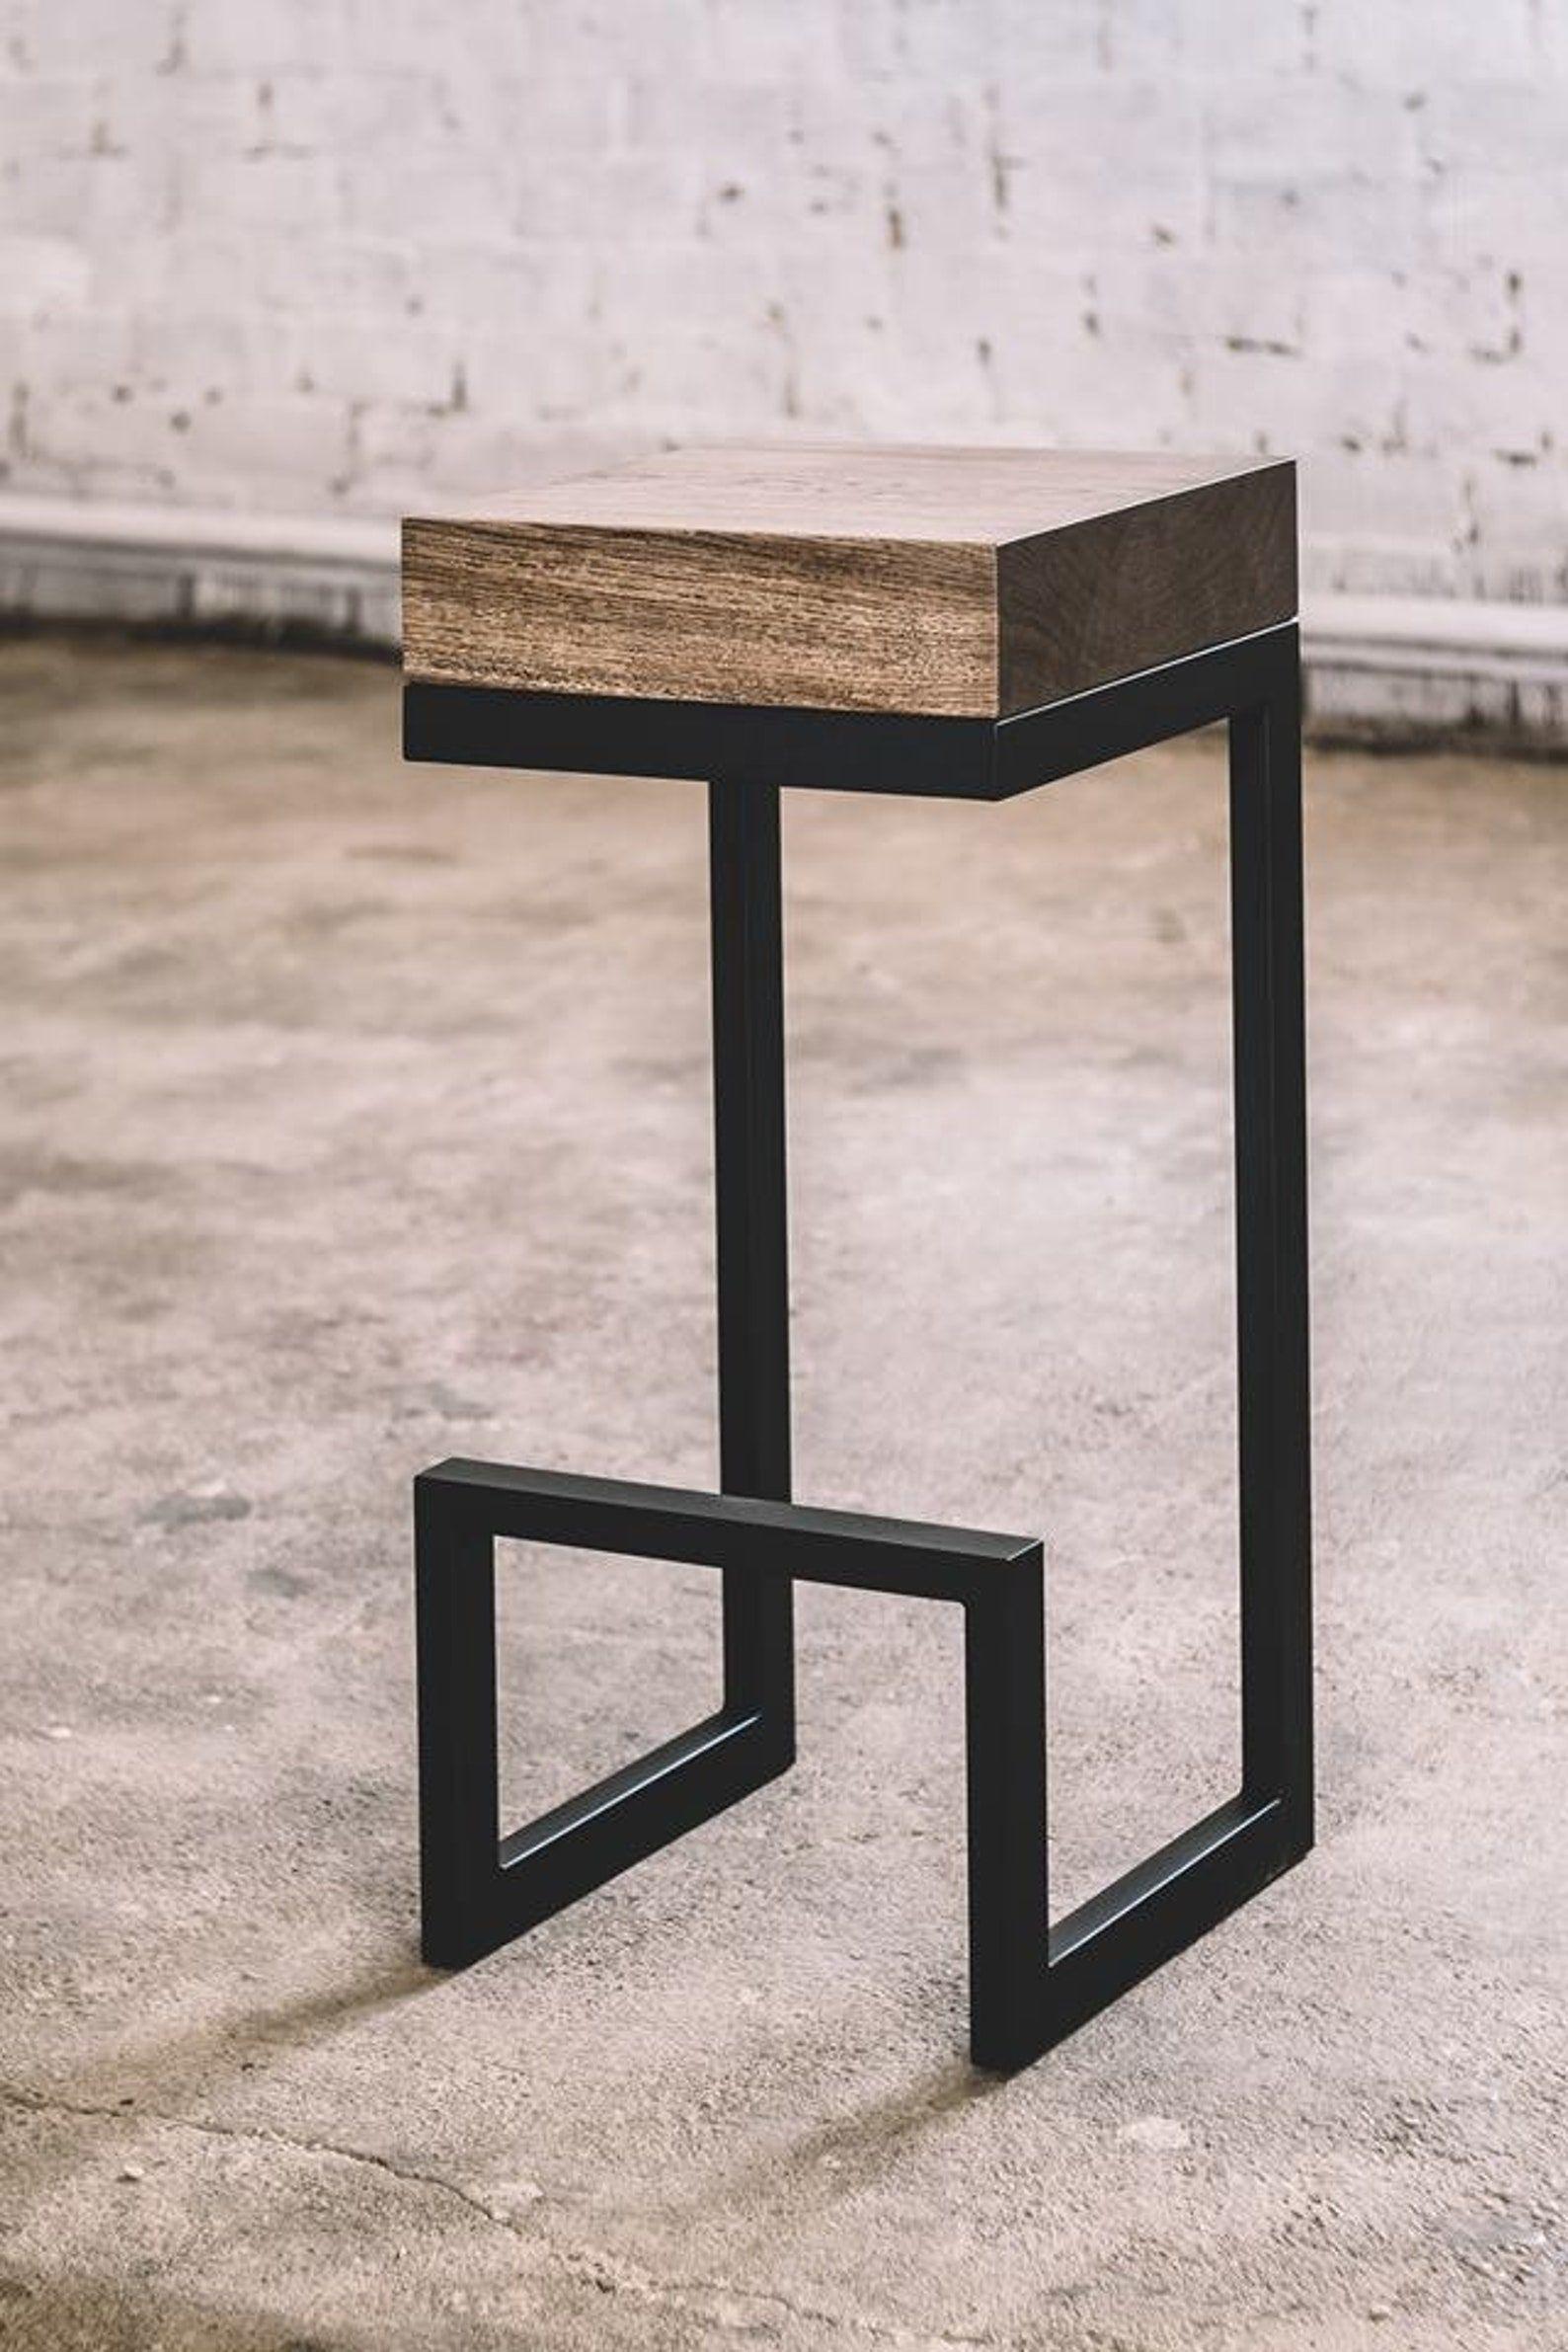 Industrial bar chair / Oak bar chair / Wooden bar chair / Modern bar chair / Geometric bar chair /Industrial furniture / Rustic furniture